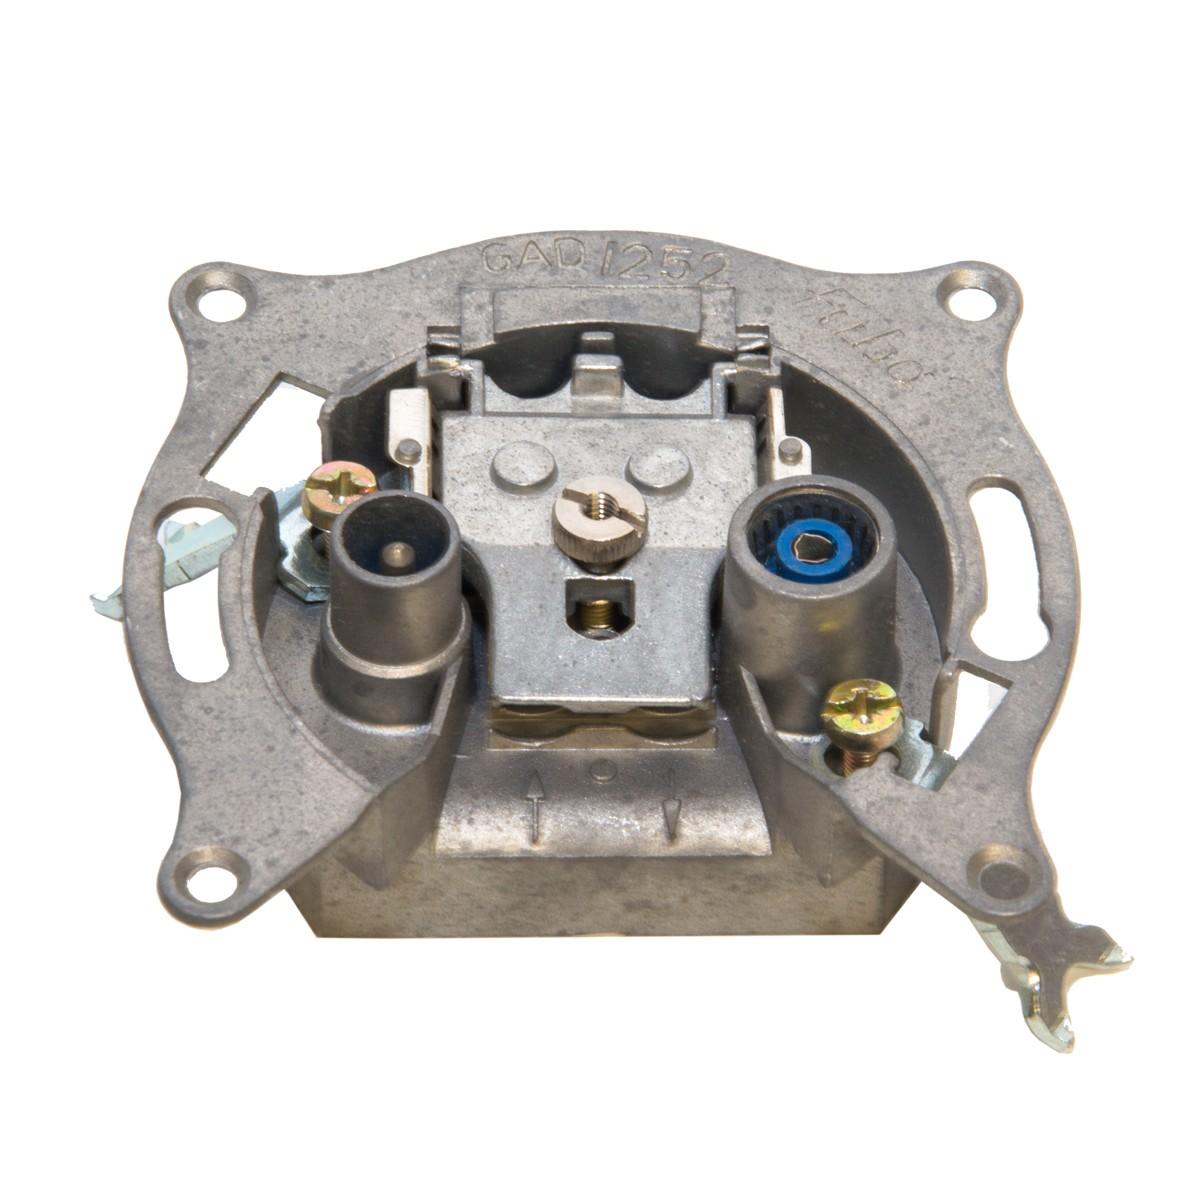 Fuba Durchgangsdose Antennen-Dose 2-Fach GAD 252 FUBA Antennendose Einzeldose